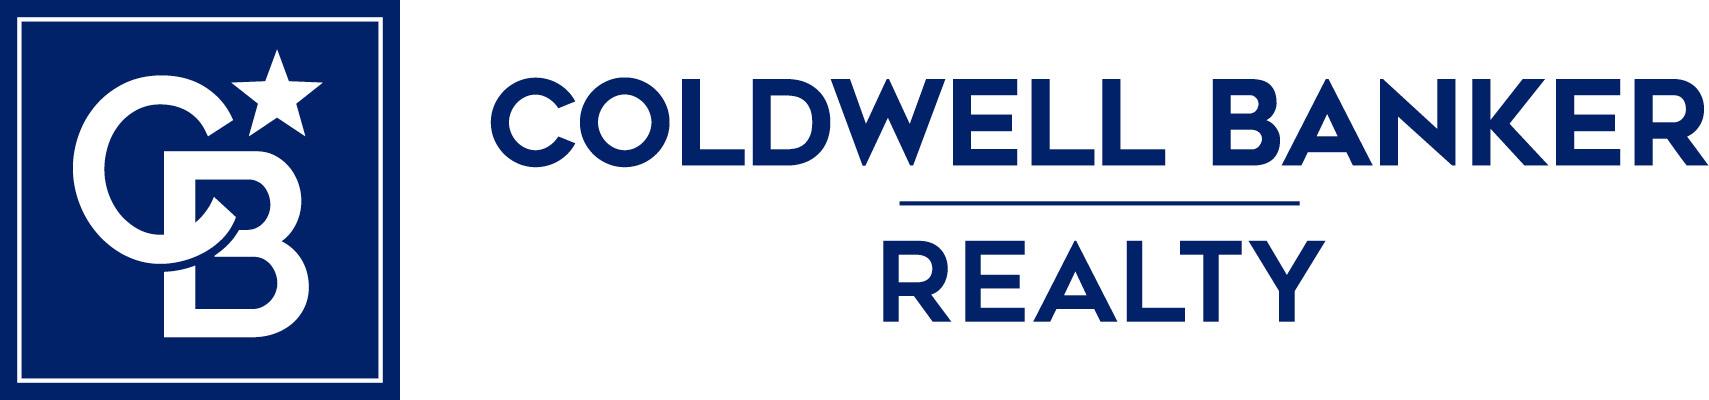 ColdwellBanker logo 2020_horz